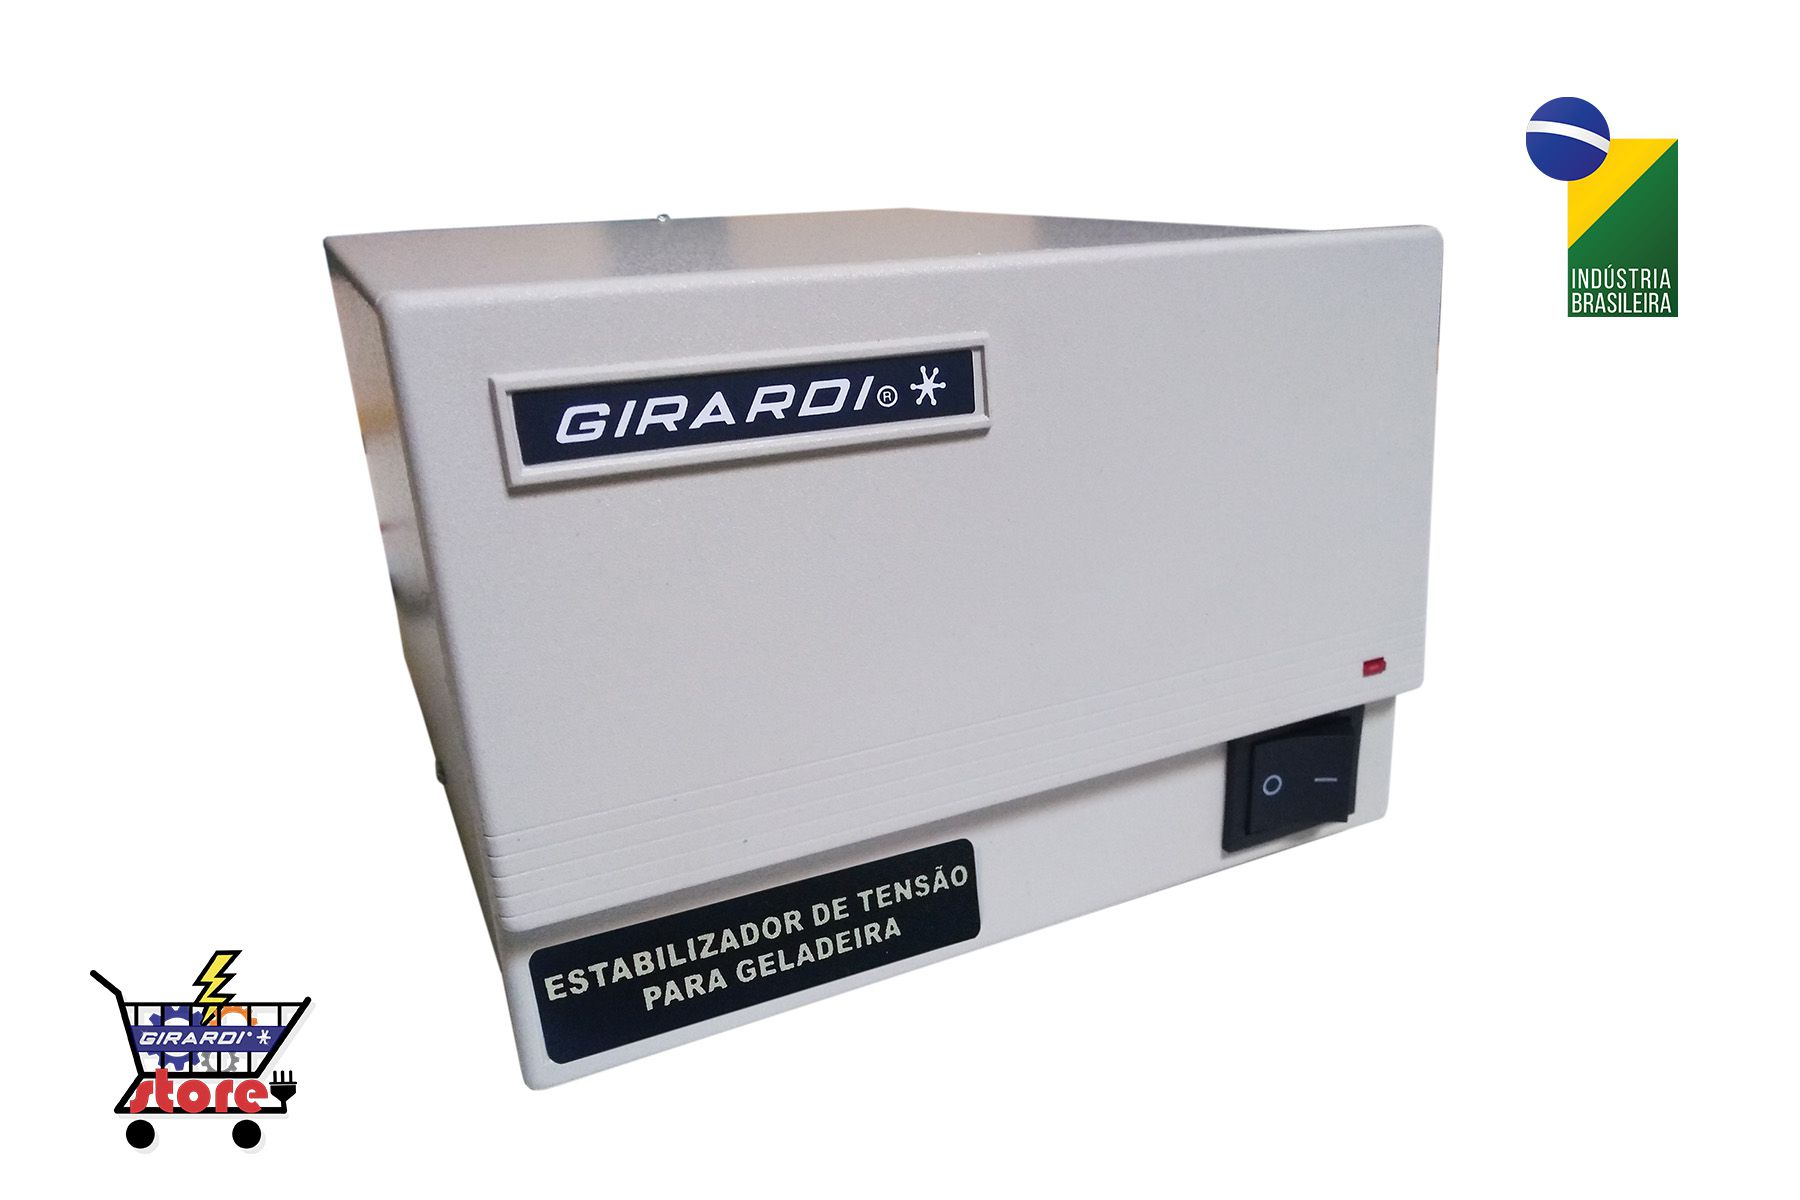 Protetor Eletrônico 1010 VA Girardi AM Bivolt / Saída 220 V